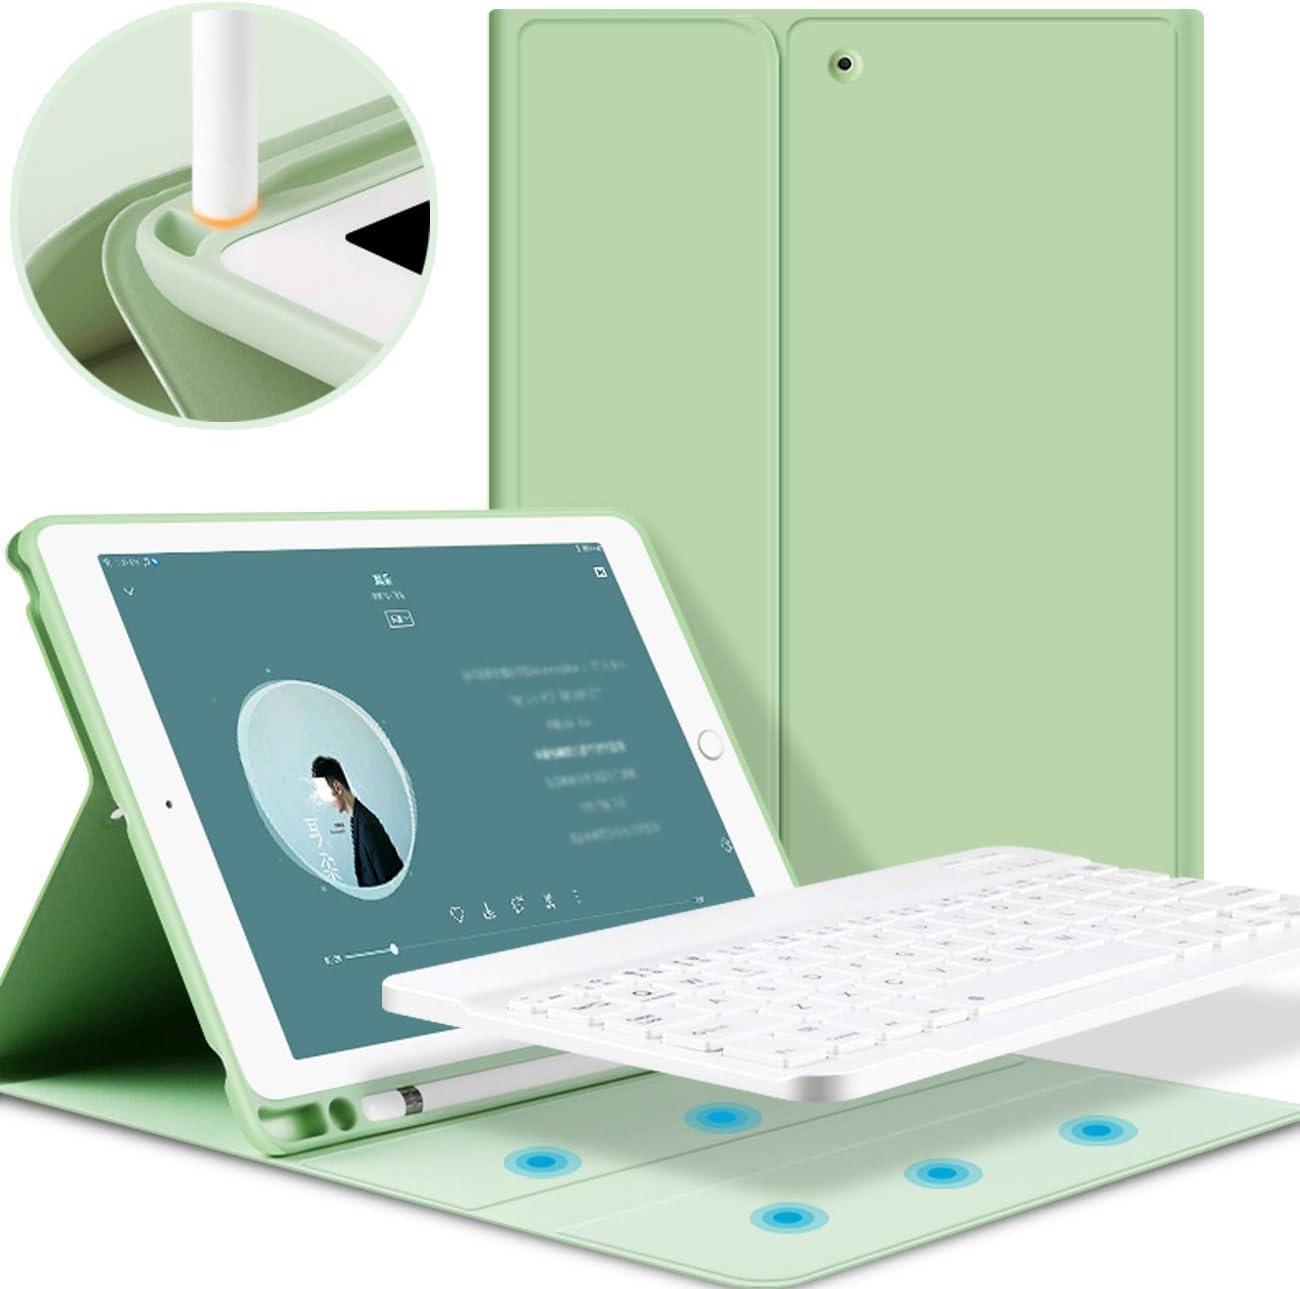 KenKe iPad Keyboard Case for iPad 2018/2017 /iPad Air 2/ Air 1 with Pencil Holder Auto Sleep/Wake with Detachable Bluetooth Keyboard Cover iPad 5th / 6th Generation 9.7 inch iPad air case -Green